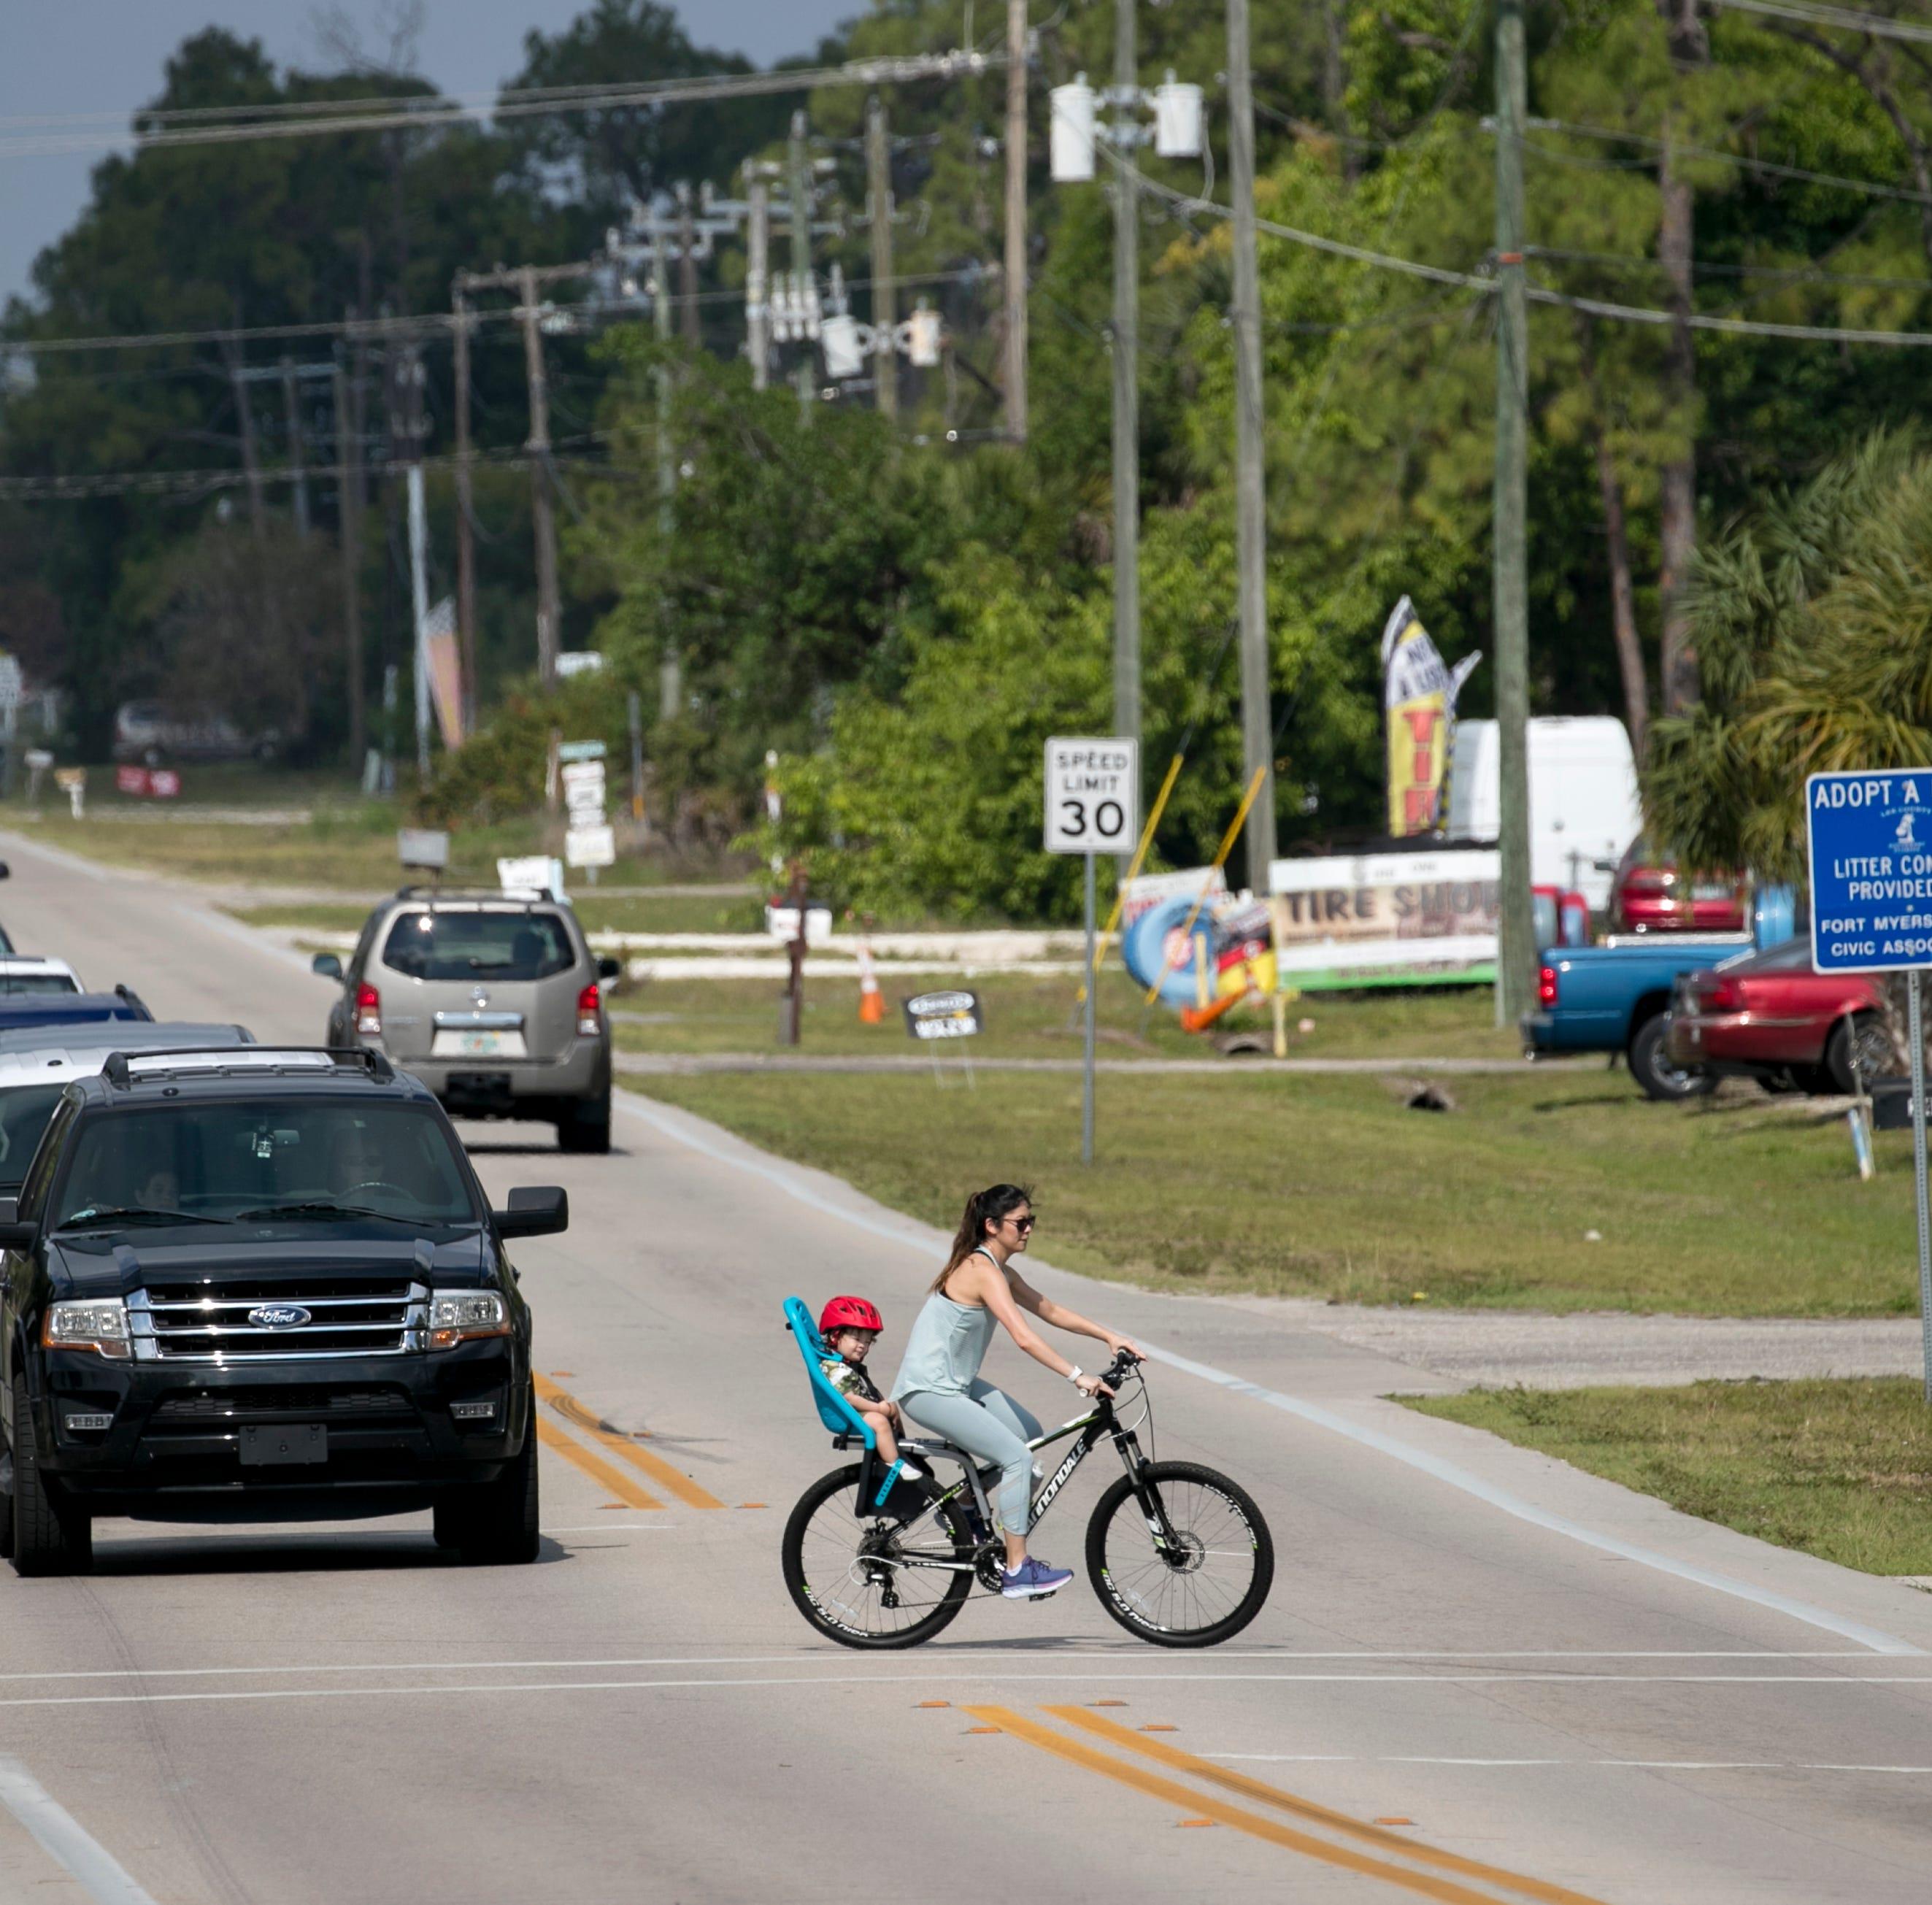 After tourist season traffic jams, commissioners eye new traffic fixes